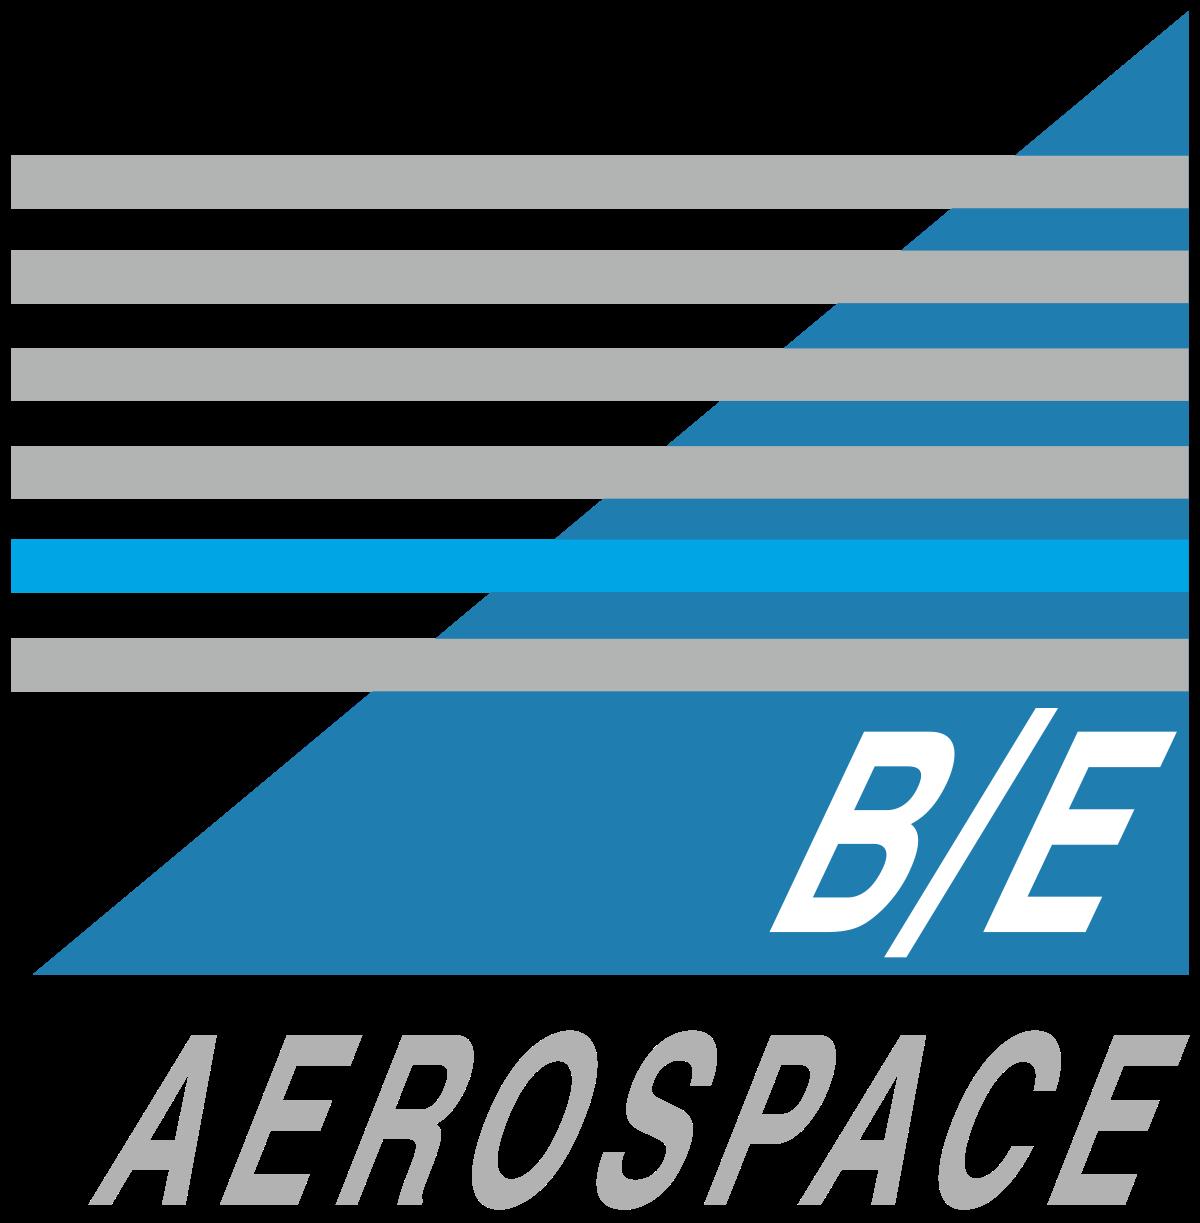 BEAerospace